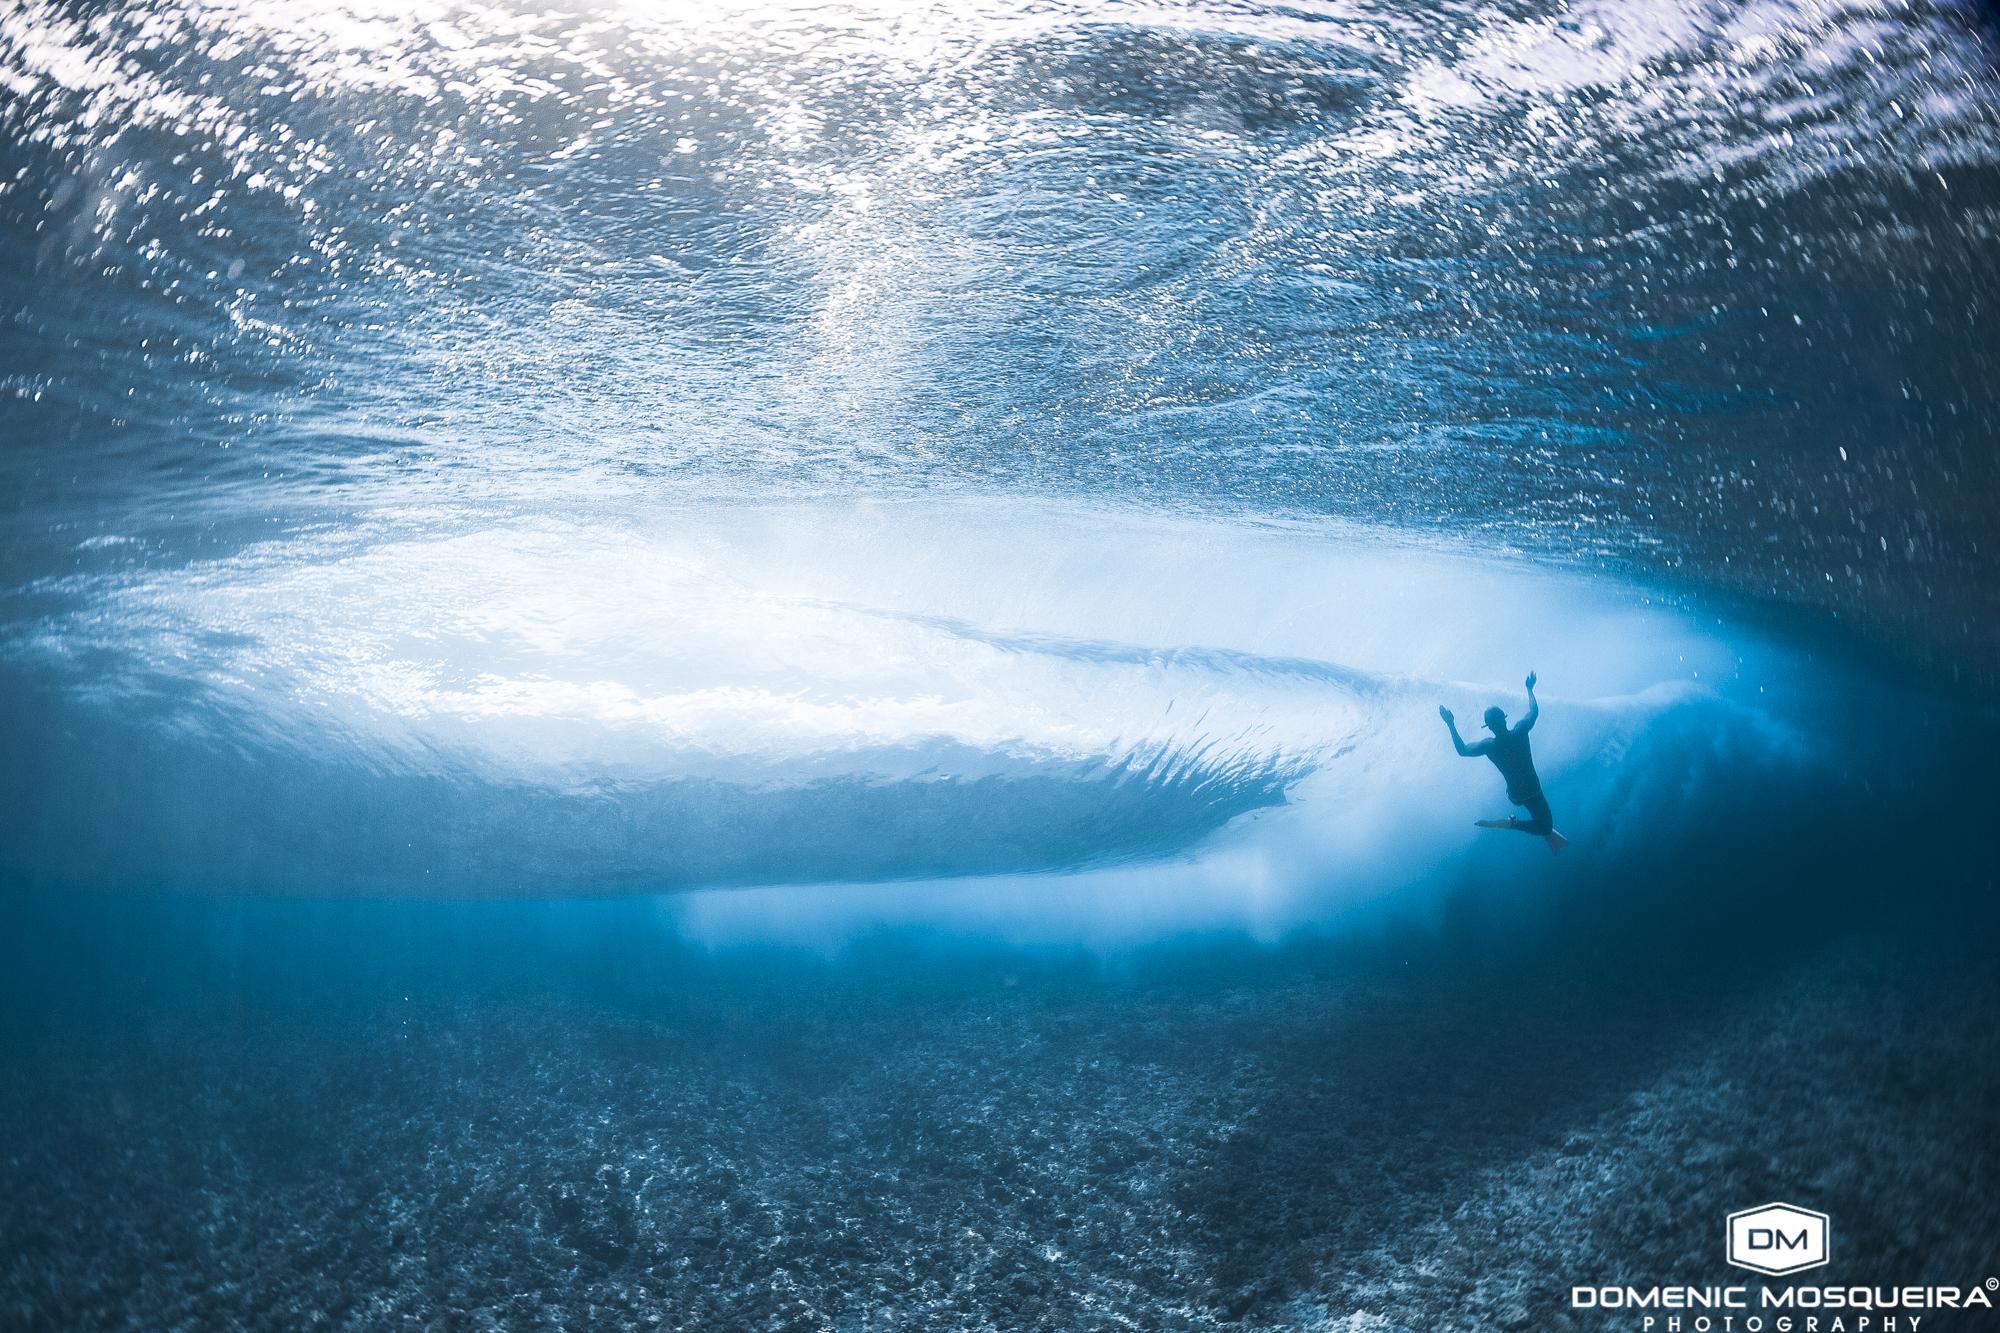 Underwater_Dance_September 19, 2016_0100_DMosqueira.jpg